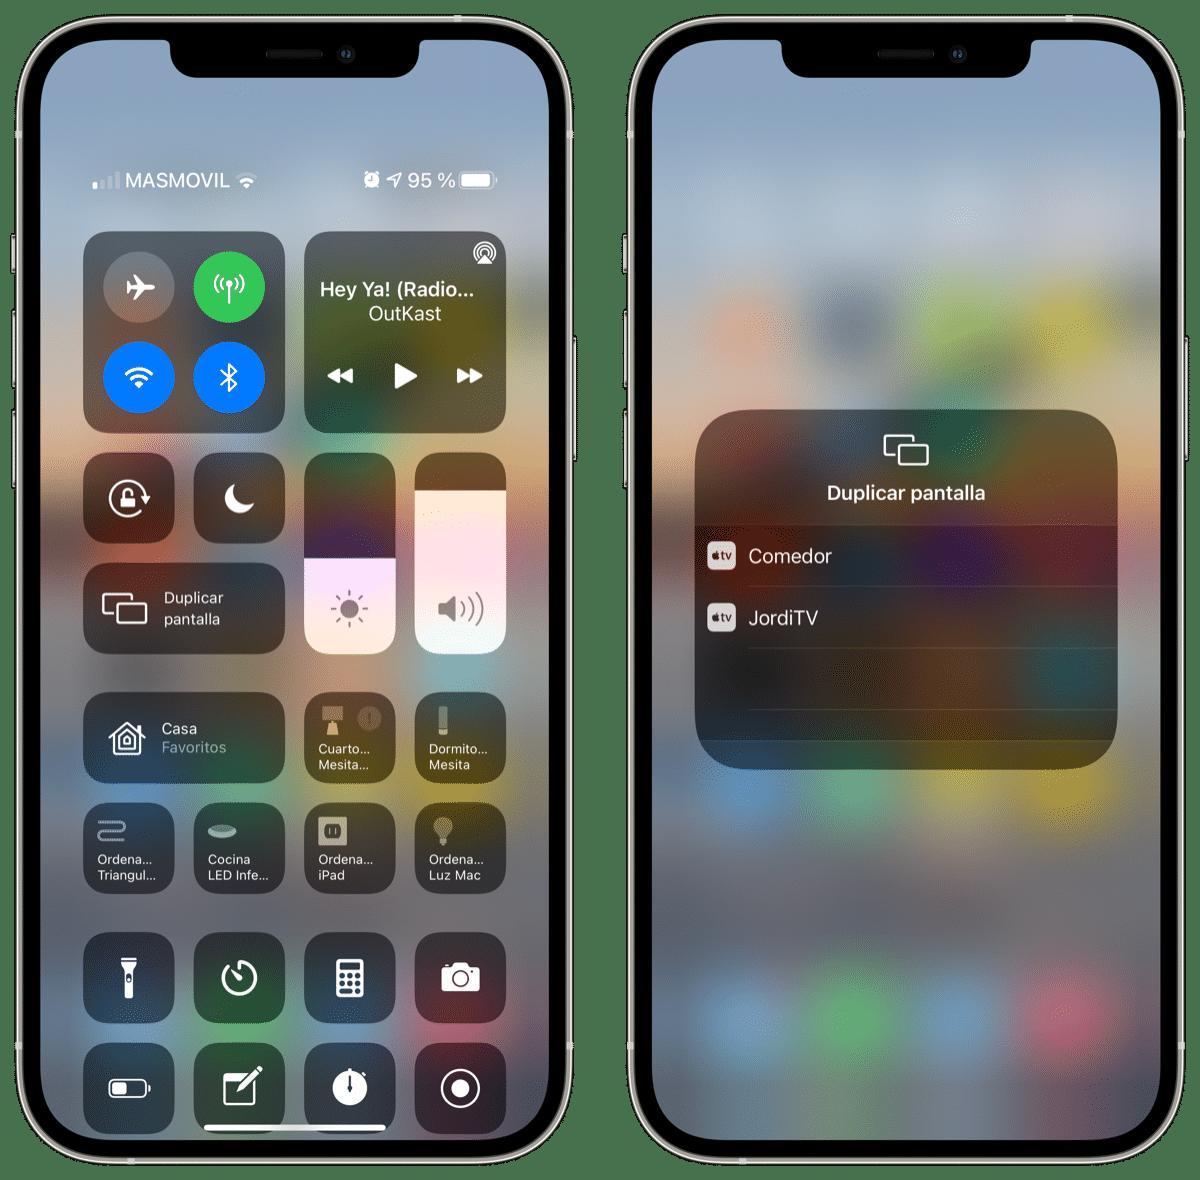 Duplicar pantalla iPhone